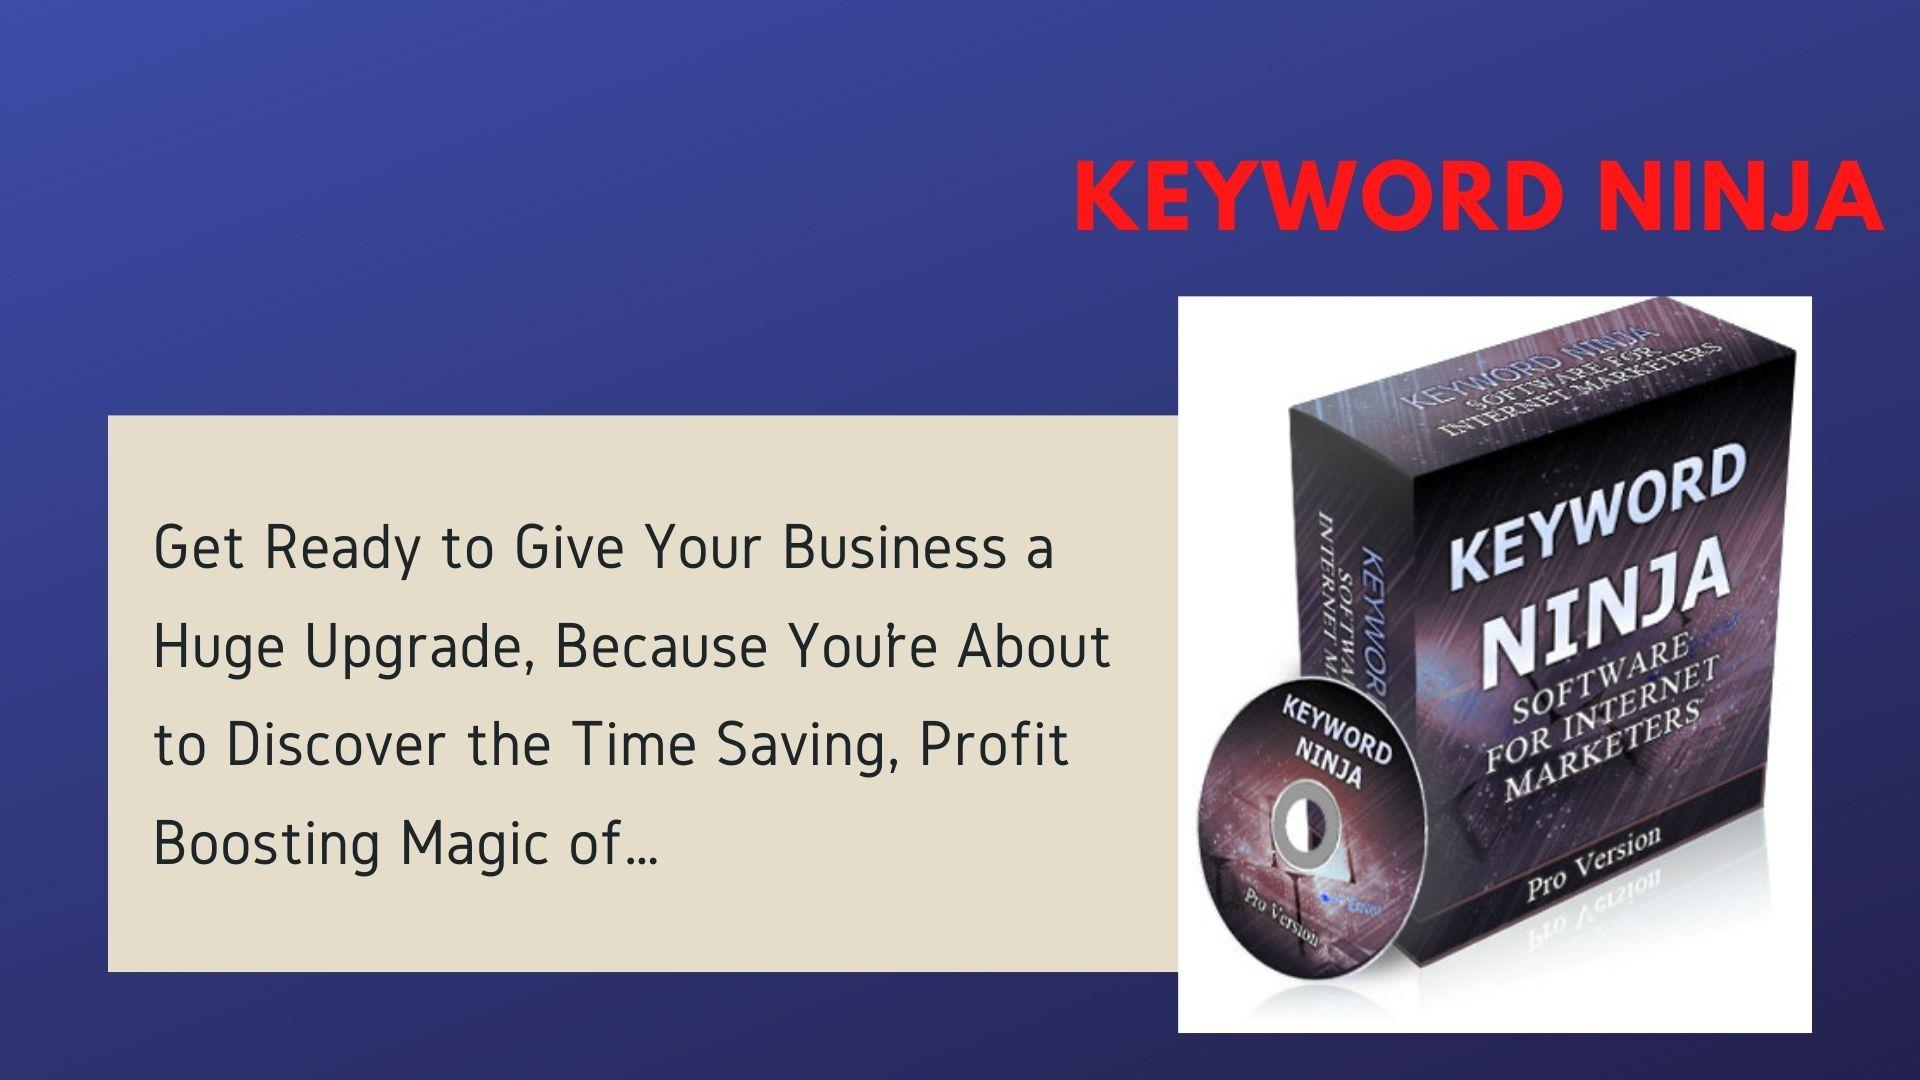 Keyword Ninja Software for Internet Marketers